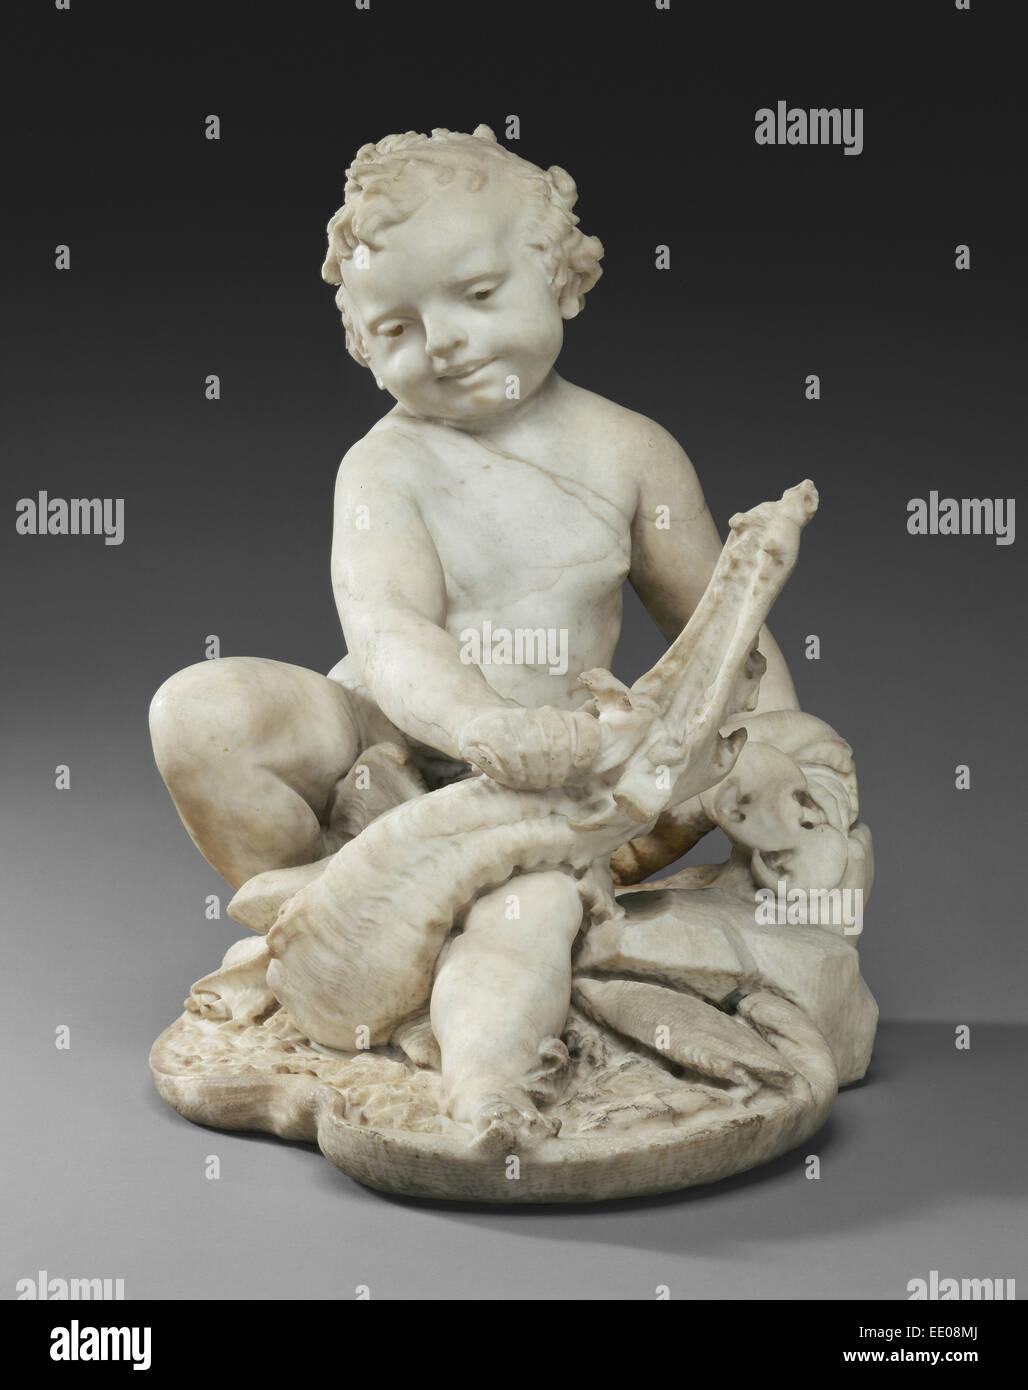 Boy with a Dragon; Pietro Bernini, Italian, 1562 - 1629, and Gian Lorenzo Bernini, Italian, 1598 - 1680; Rome, Italy, - Stock Image